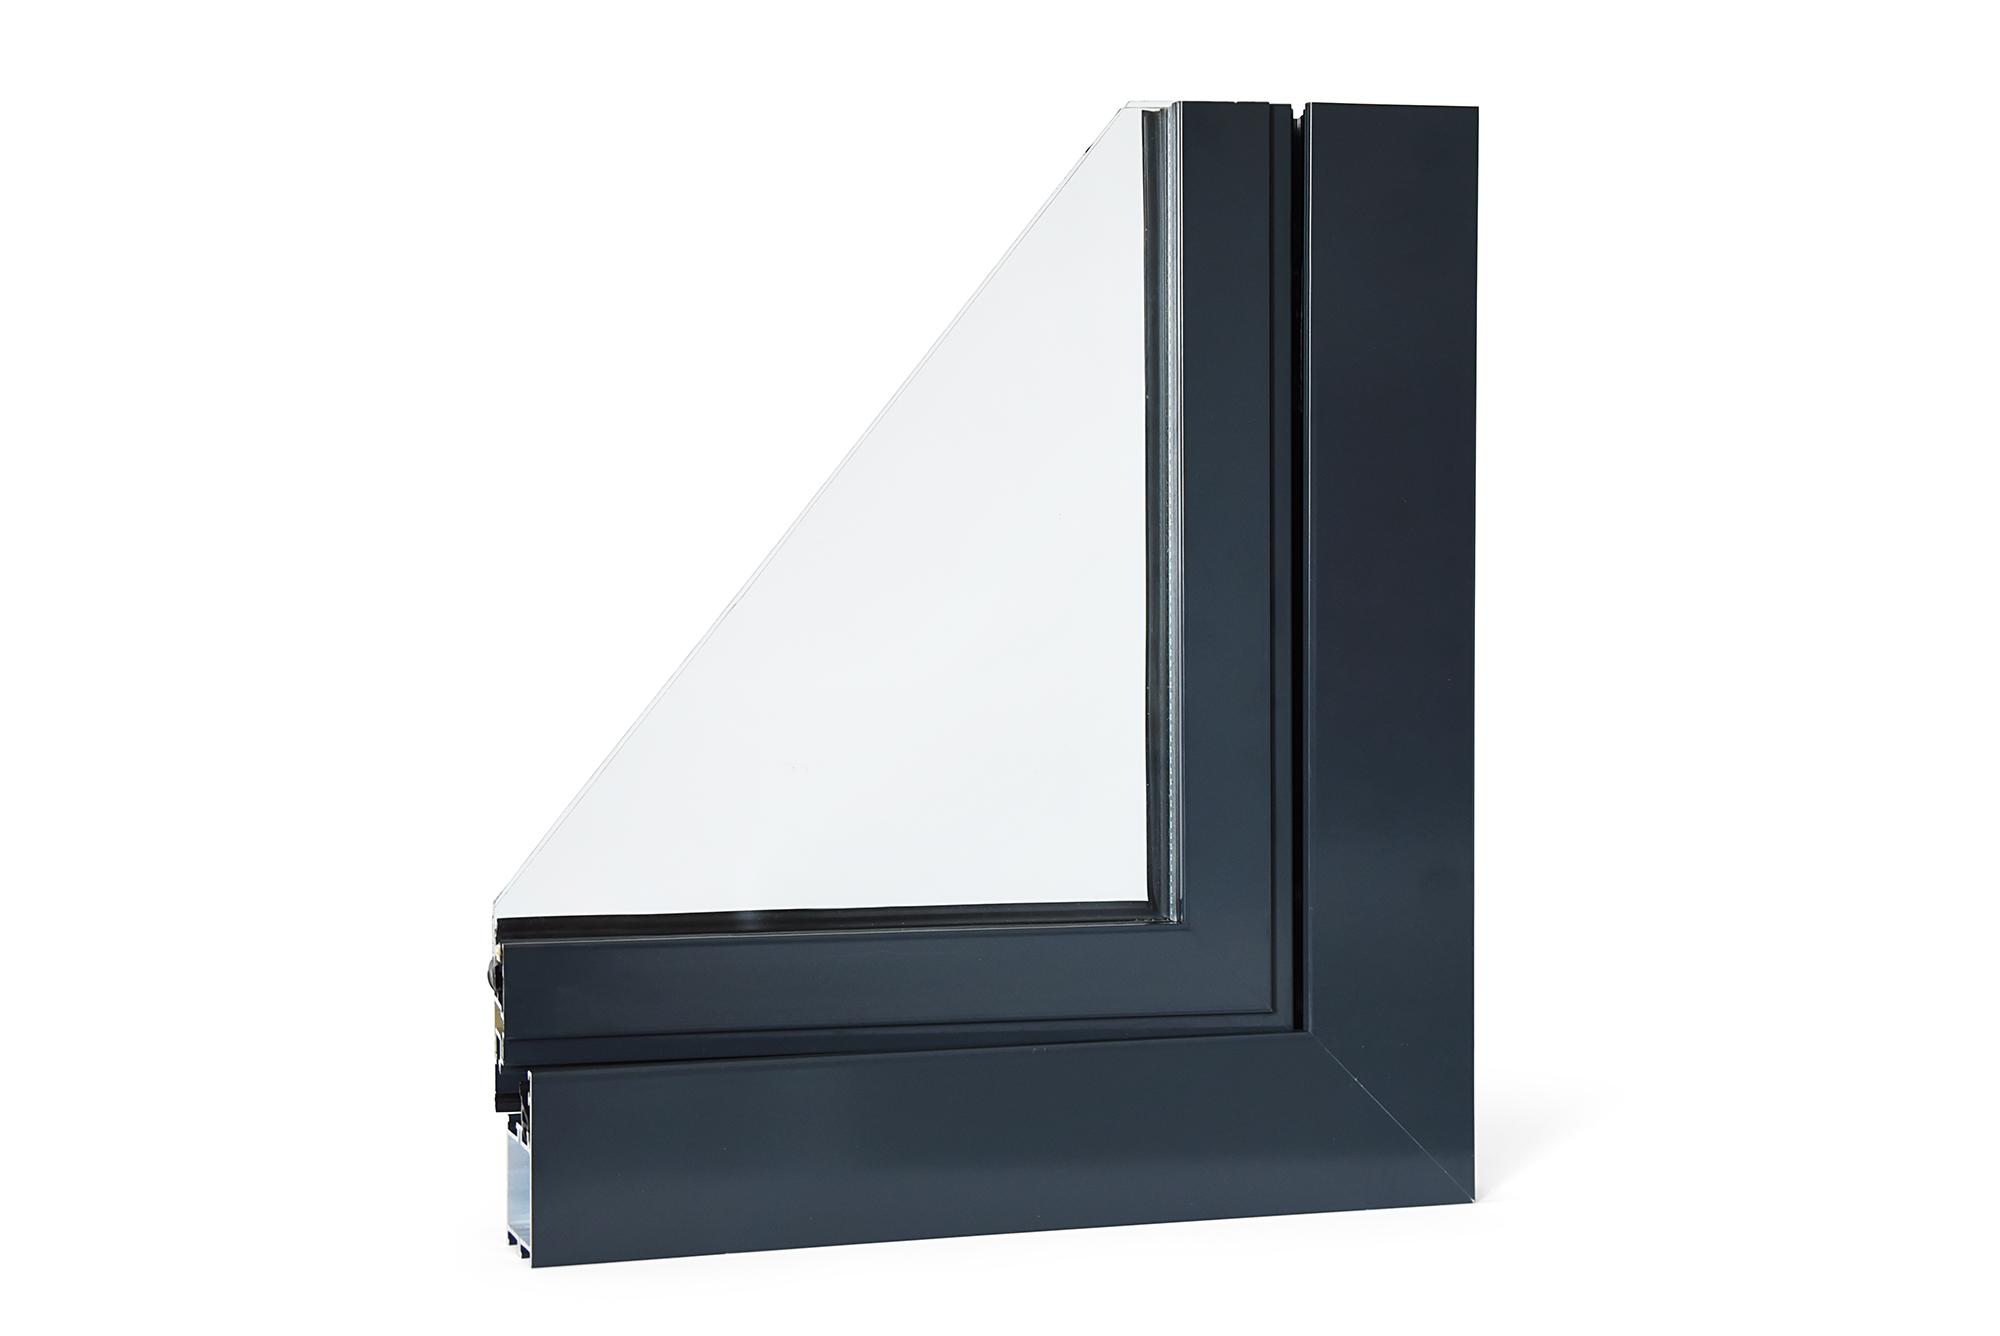 aluminiumfenster drutex alu mb 45 fenster dreh kipp wei shop fenster alle profile. Black Bedroom Furniture Sets. Home Design Ideas